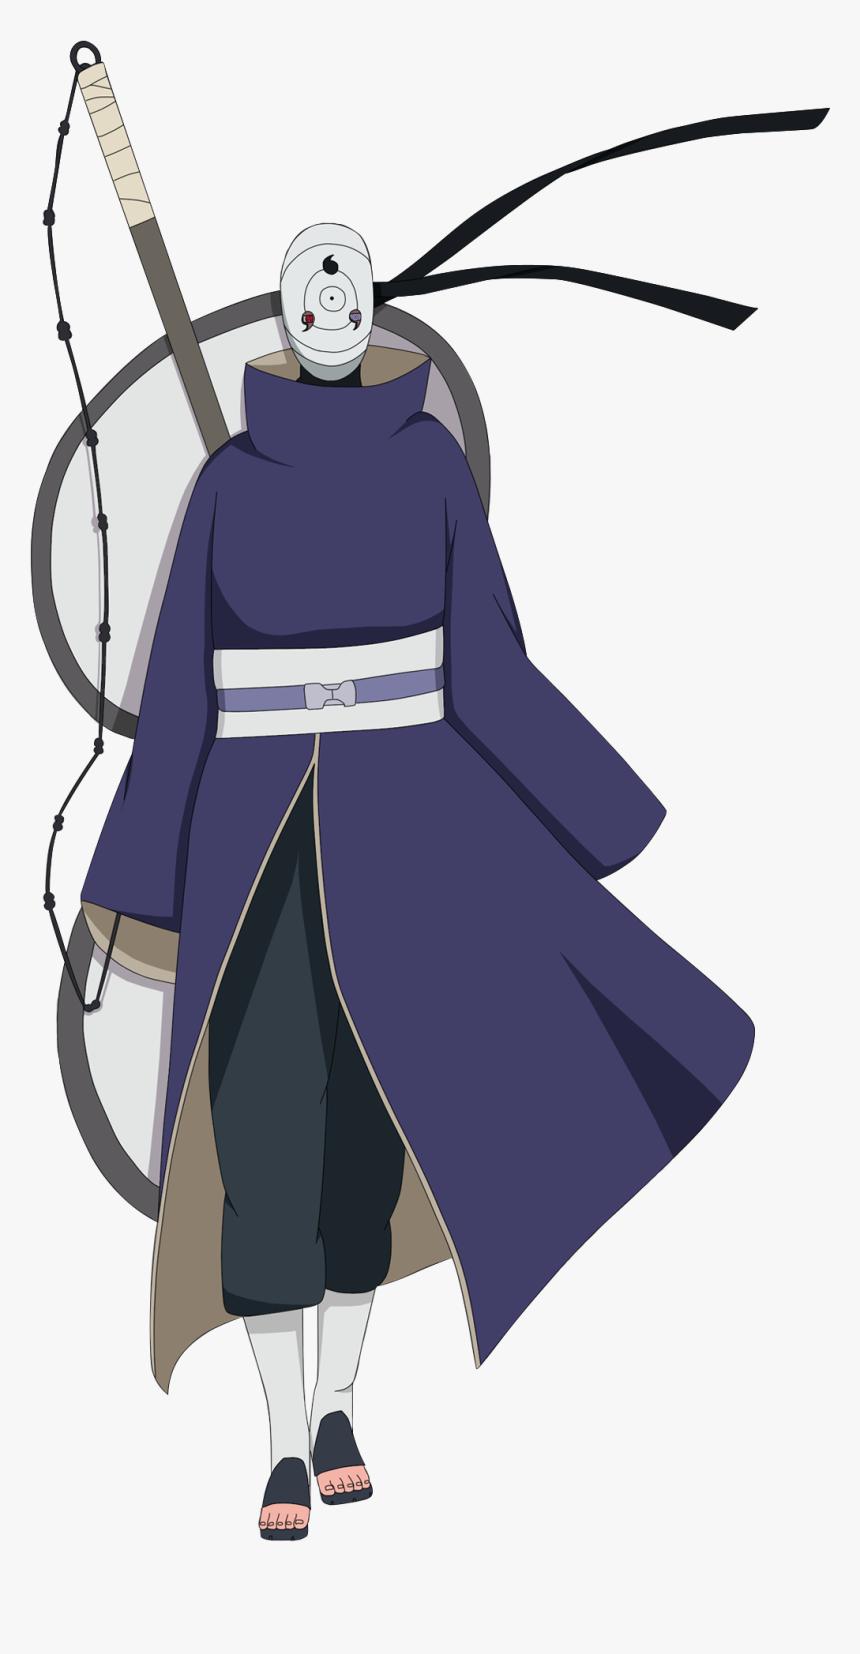 Naruto Cosplay Akatsuki Ninja Tobi Obito Madara Uchiha Obito Uchiha Wallpaper Phone Hd Png Download Transparent Png Image Pngitem